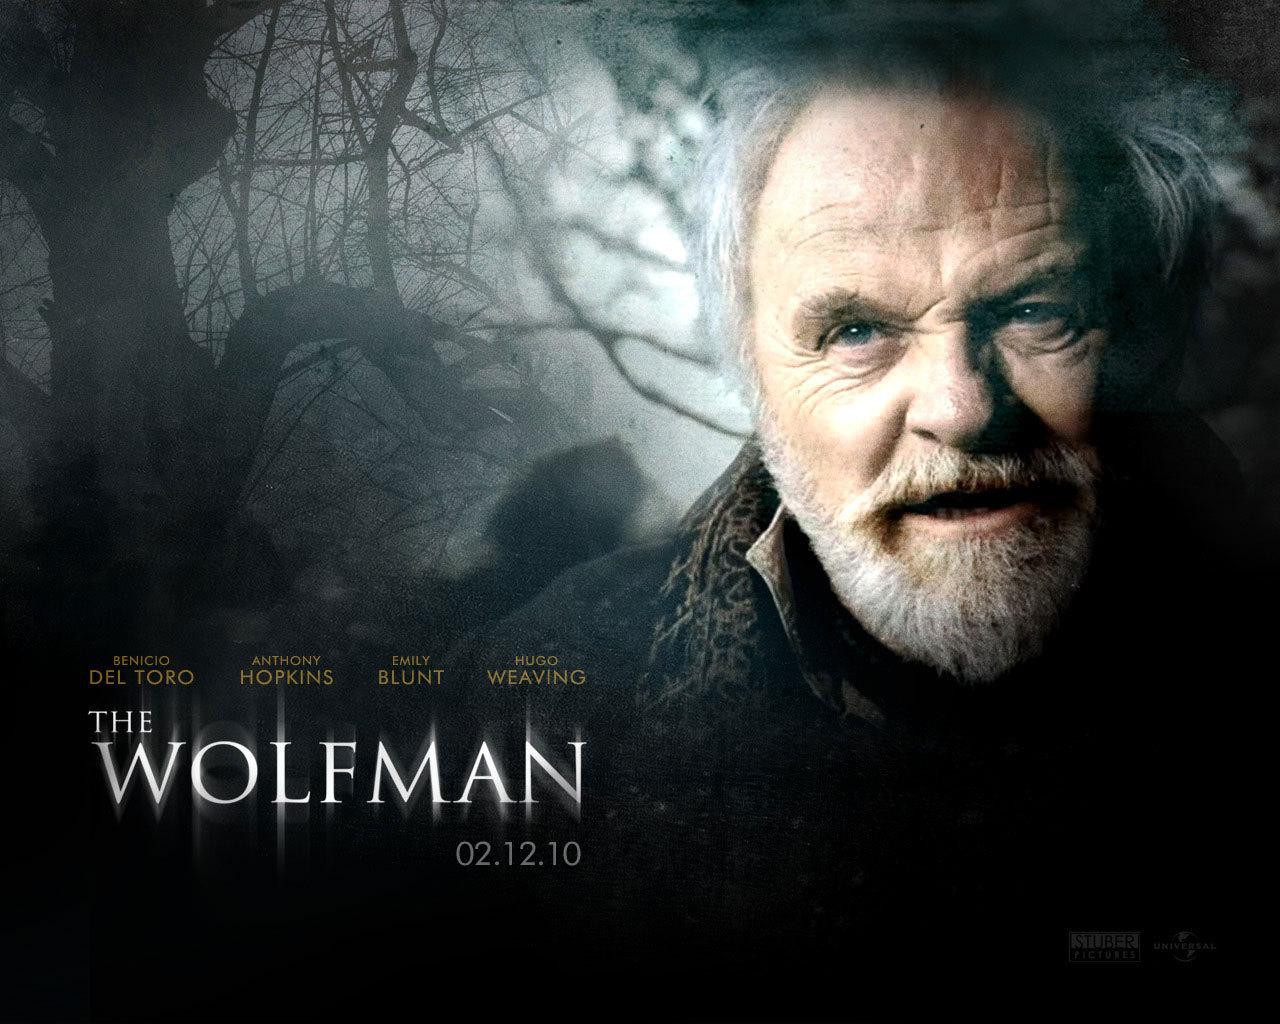 the wolfman 2010 upcoming movies wallpaper 9873393